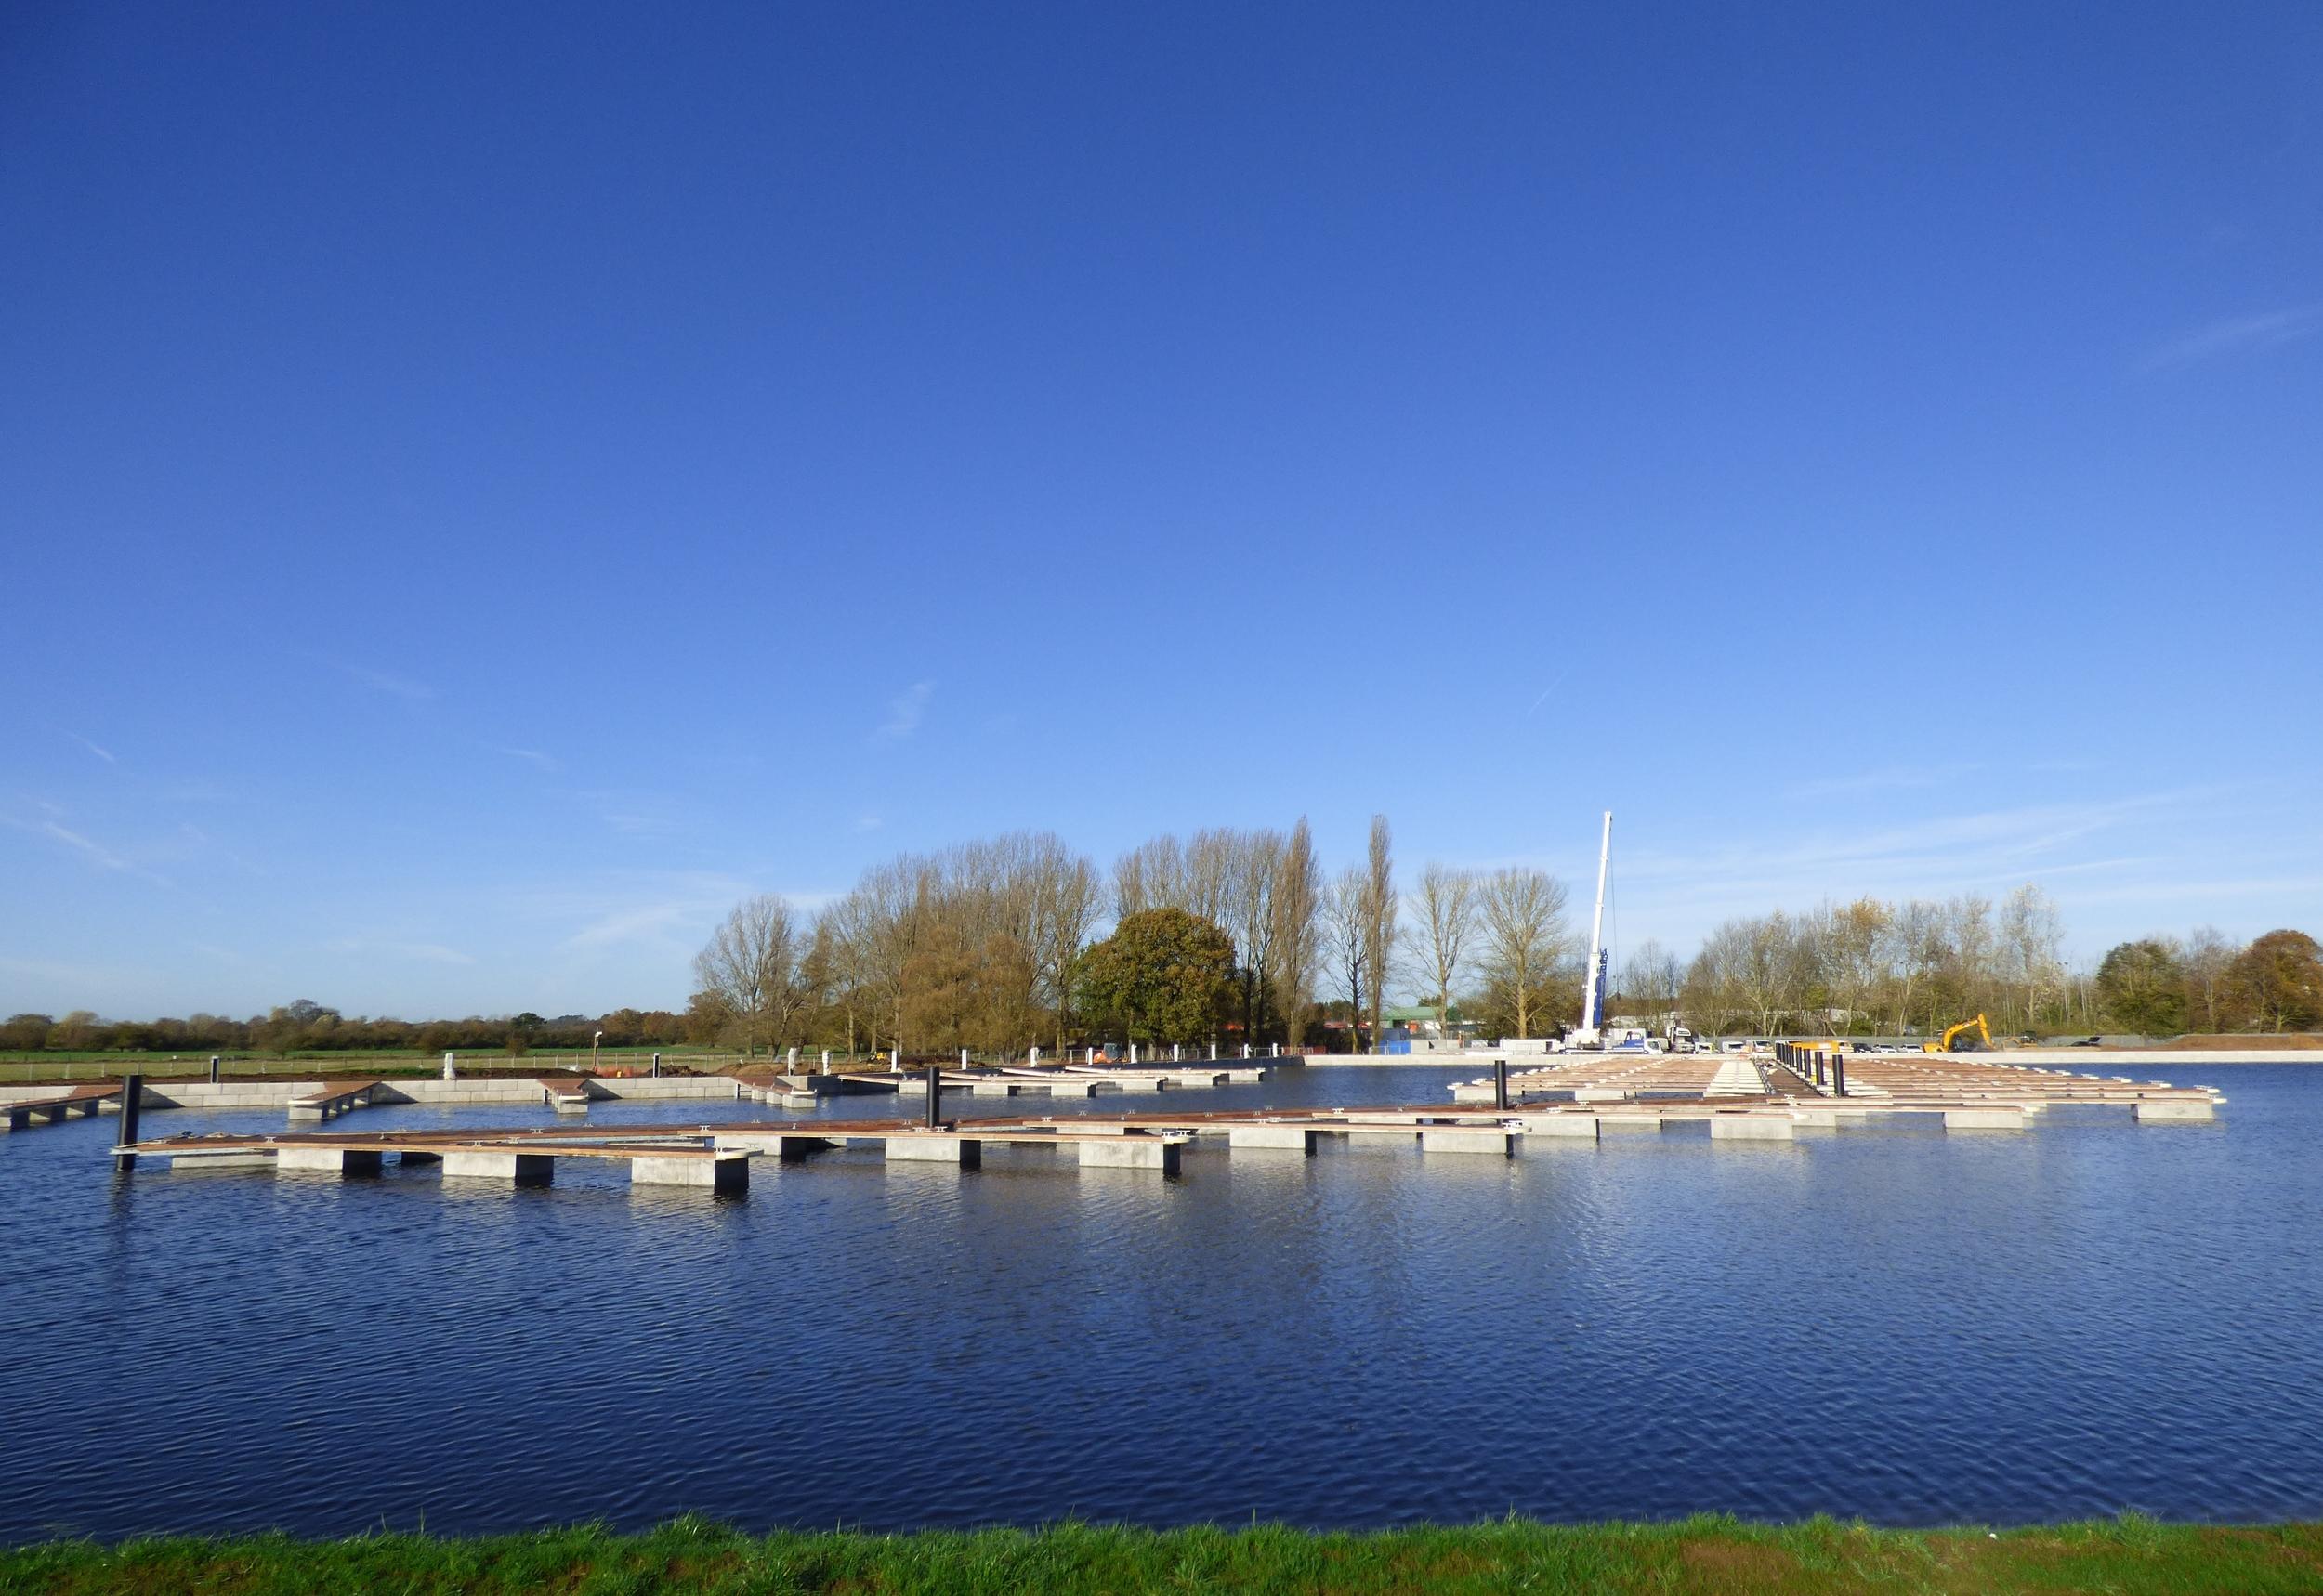 white_mills_marina_floating_pontoons_river_nen